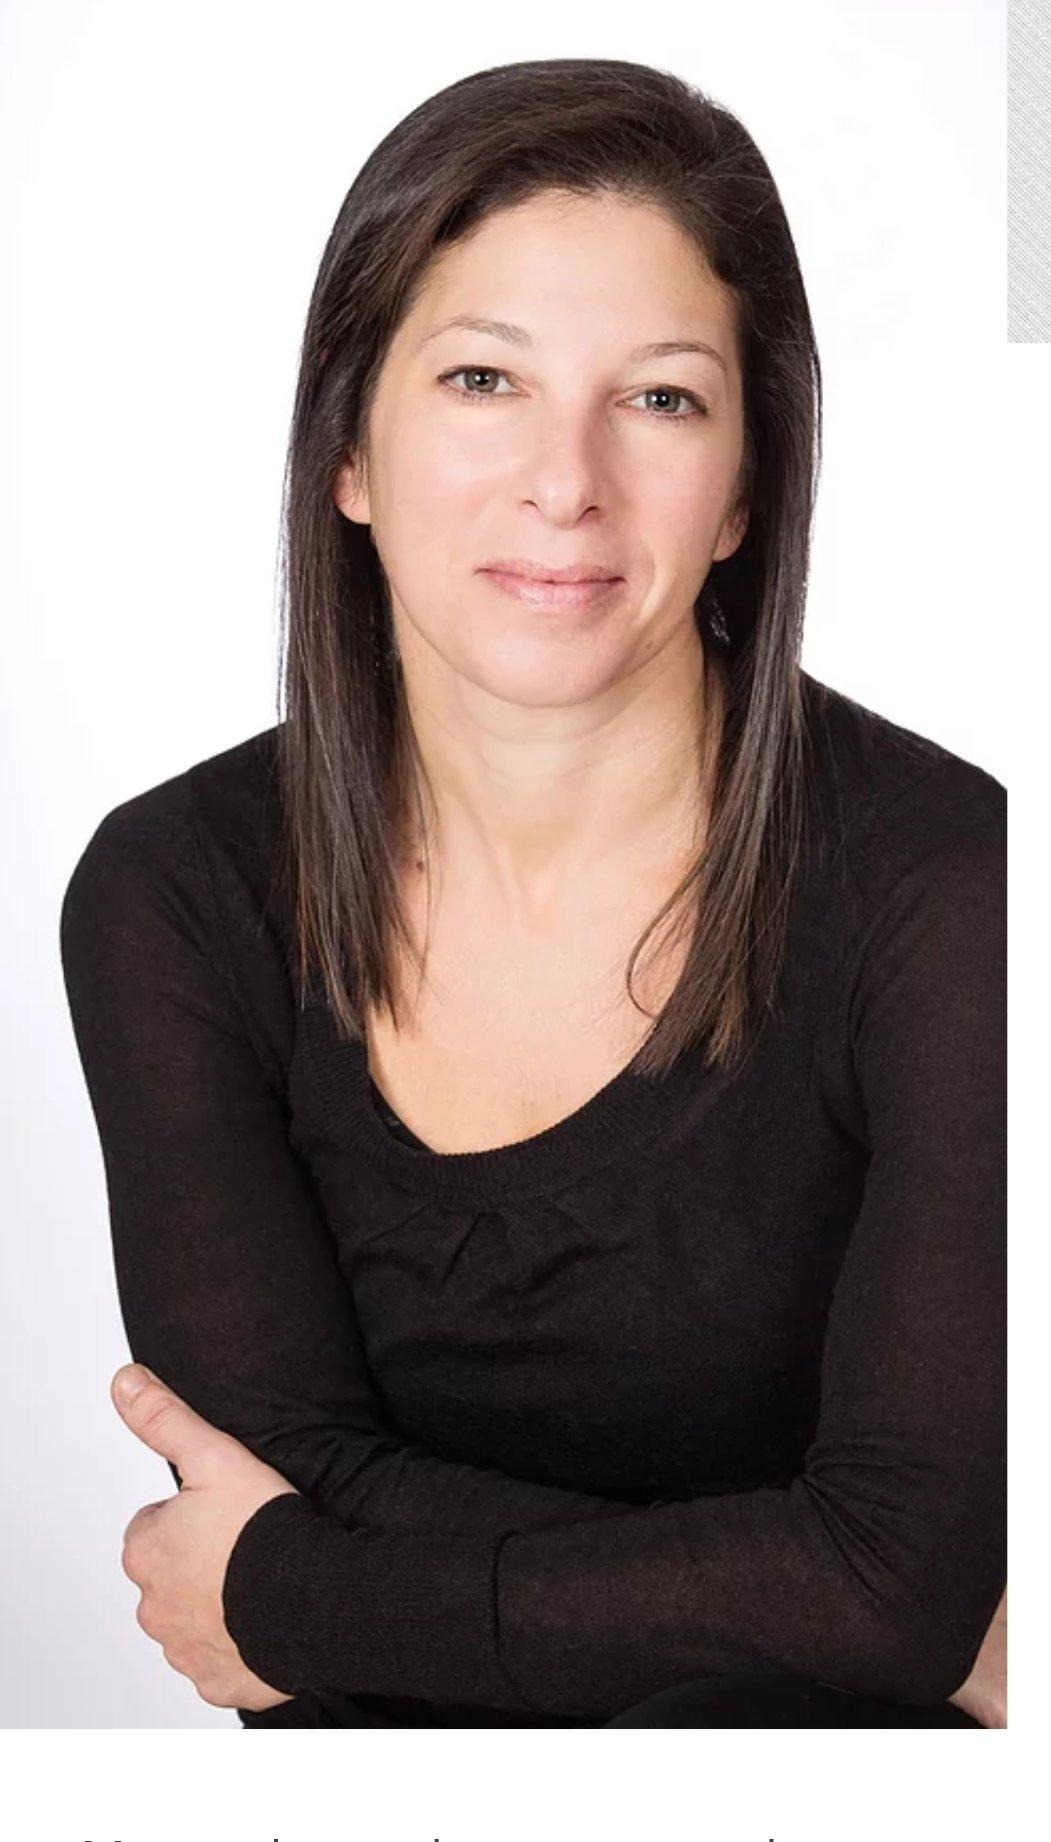 Margot Mostyn Toronto RMT